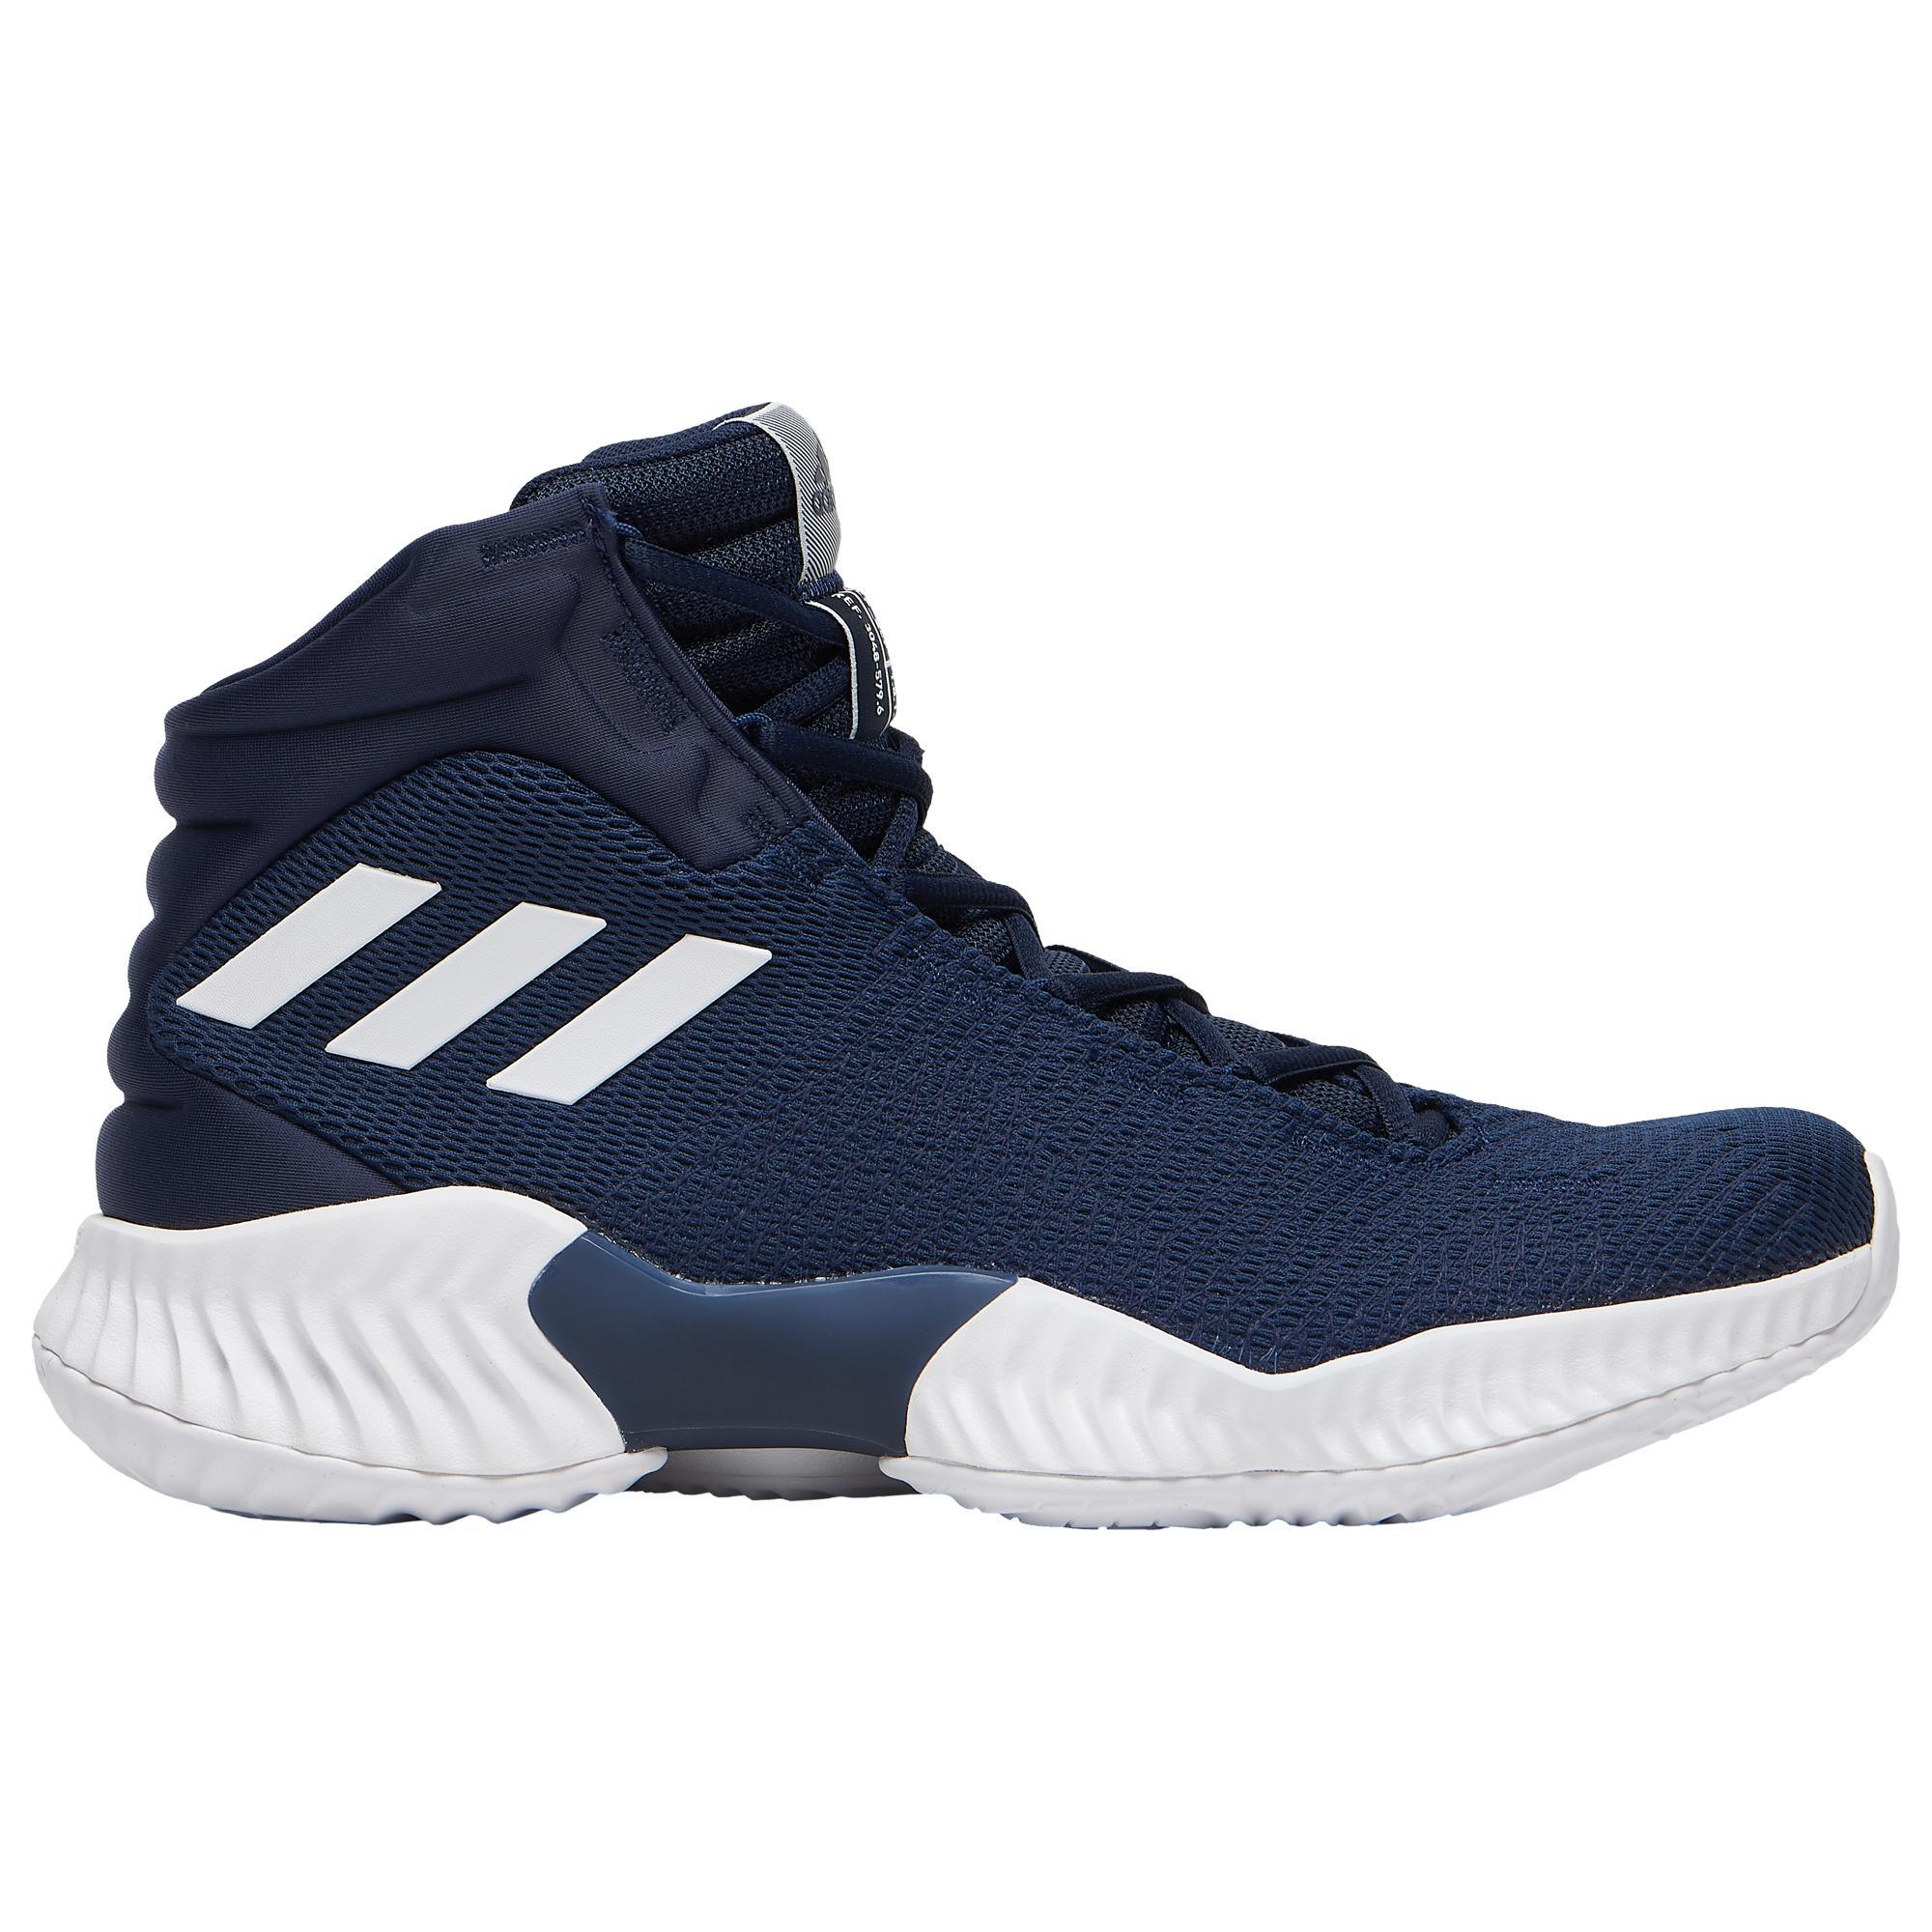 adidas Pro Bounce Mid 2018 Basketball